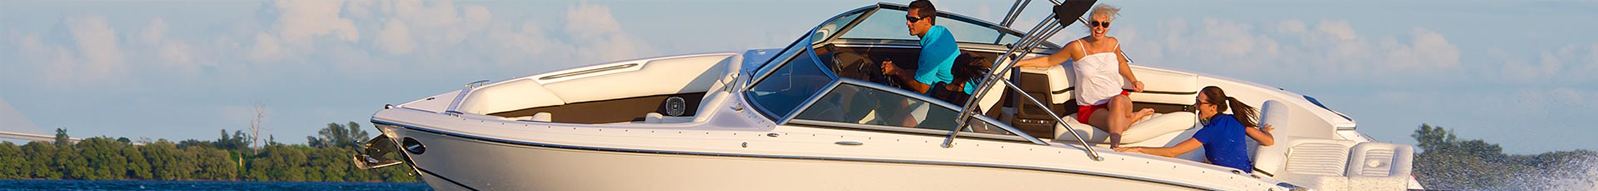 inshore yachts wholesaler golfe juan achat bateau occasion